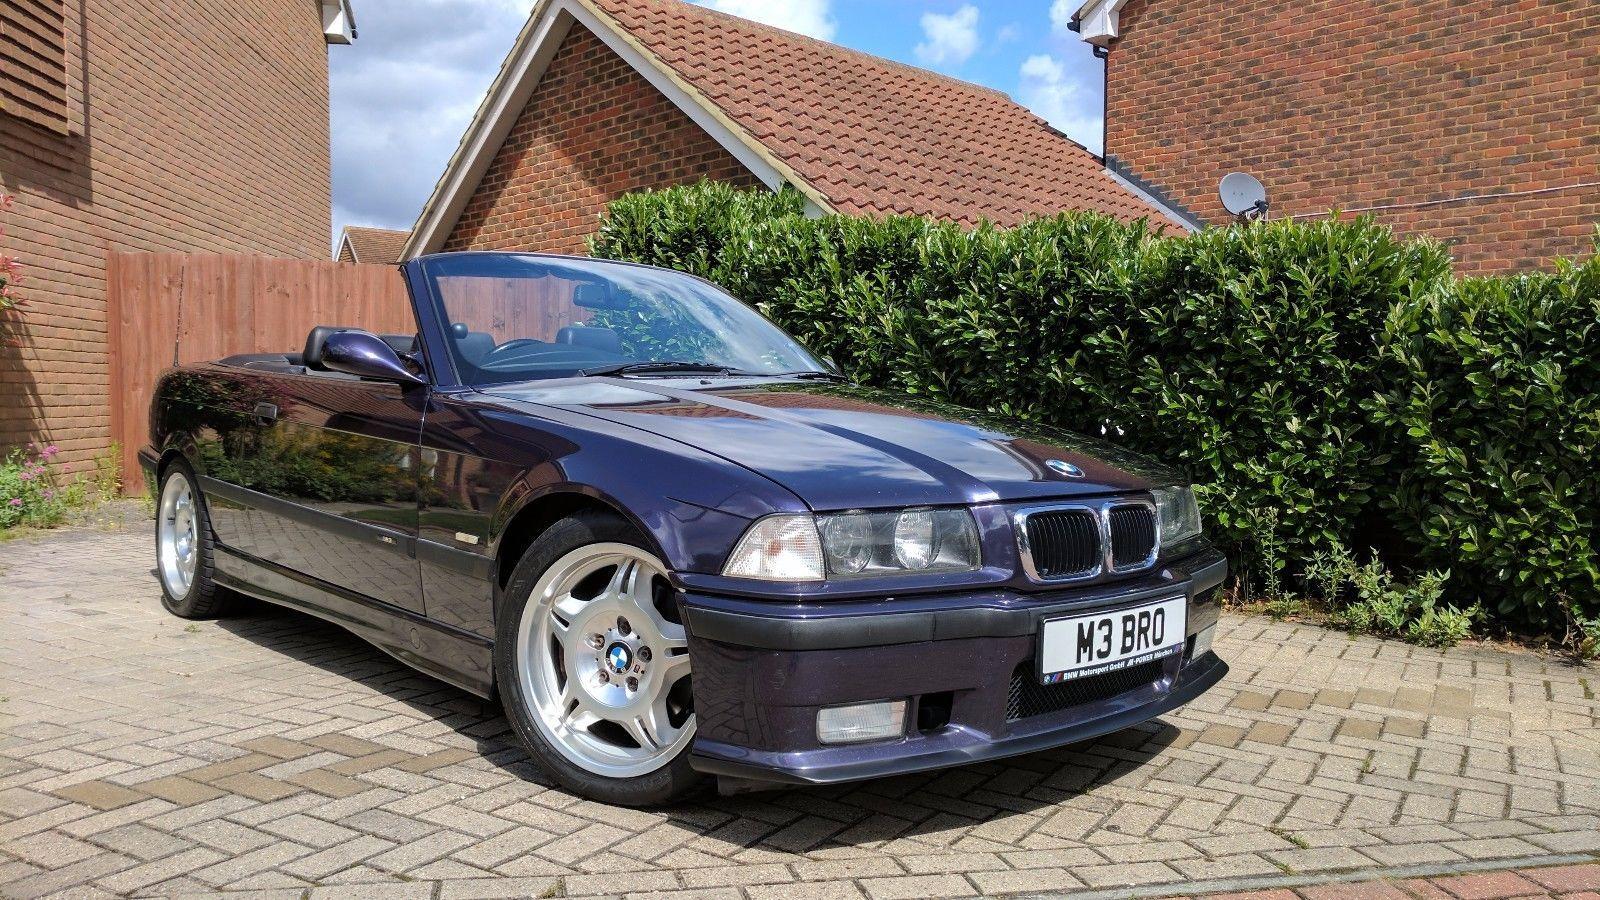 medium resolution of bmw m3 e36 evo cabriolet convertible techno violet fsh vgc hardtop 1998 cabrio